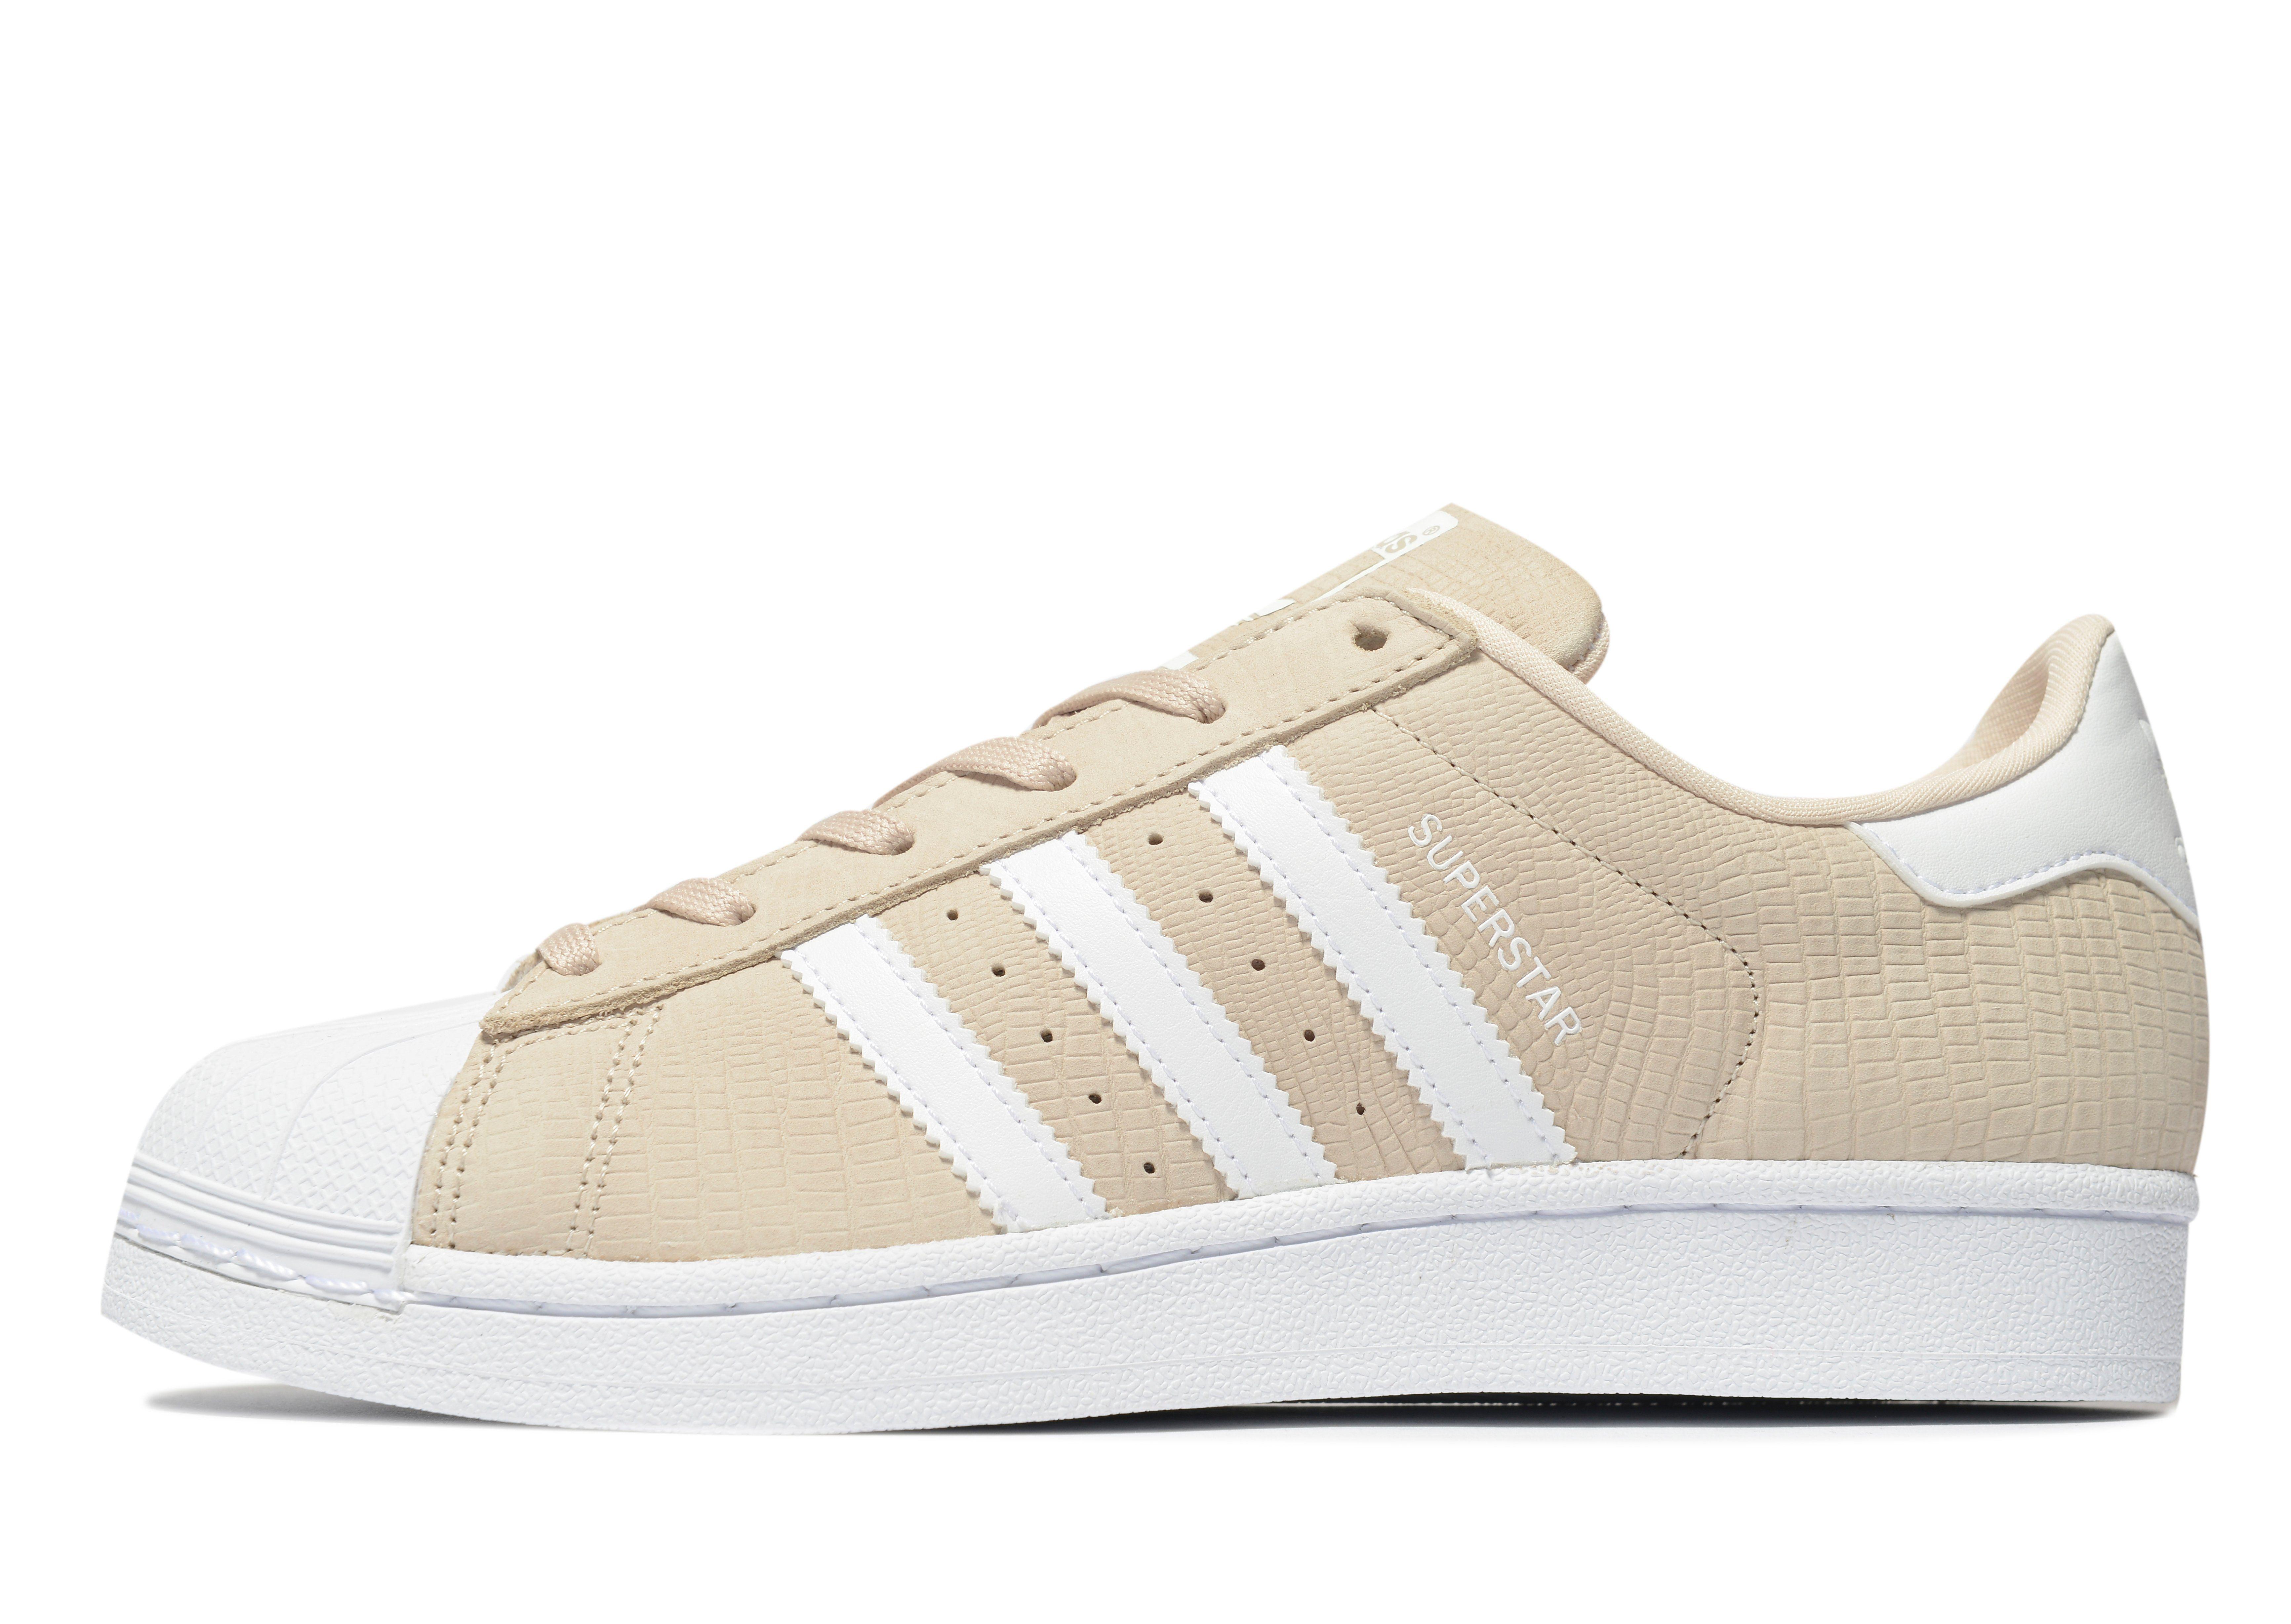 Adidas Superstar Jd